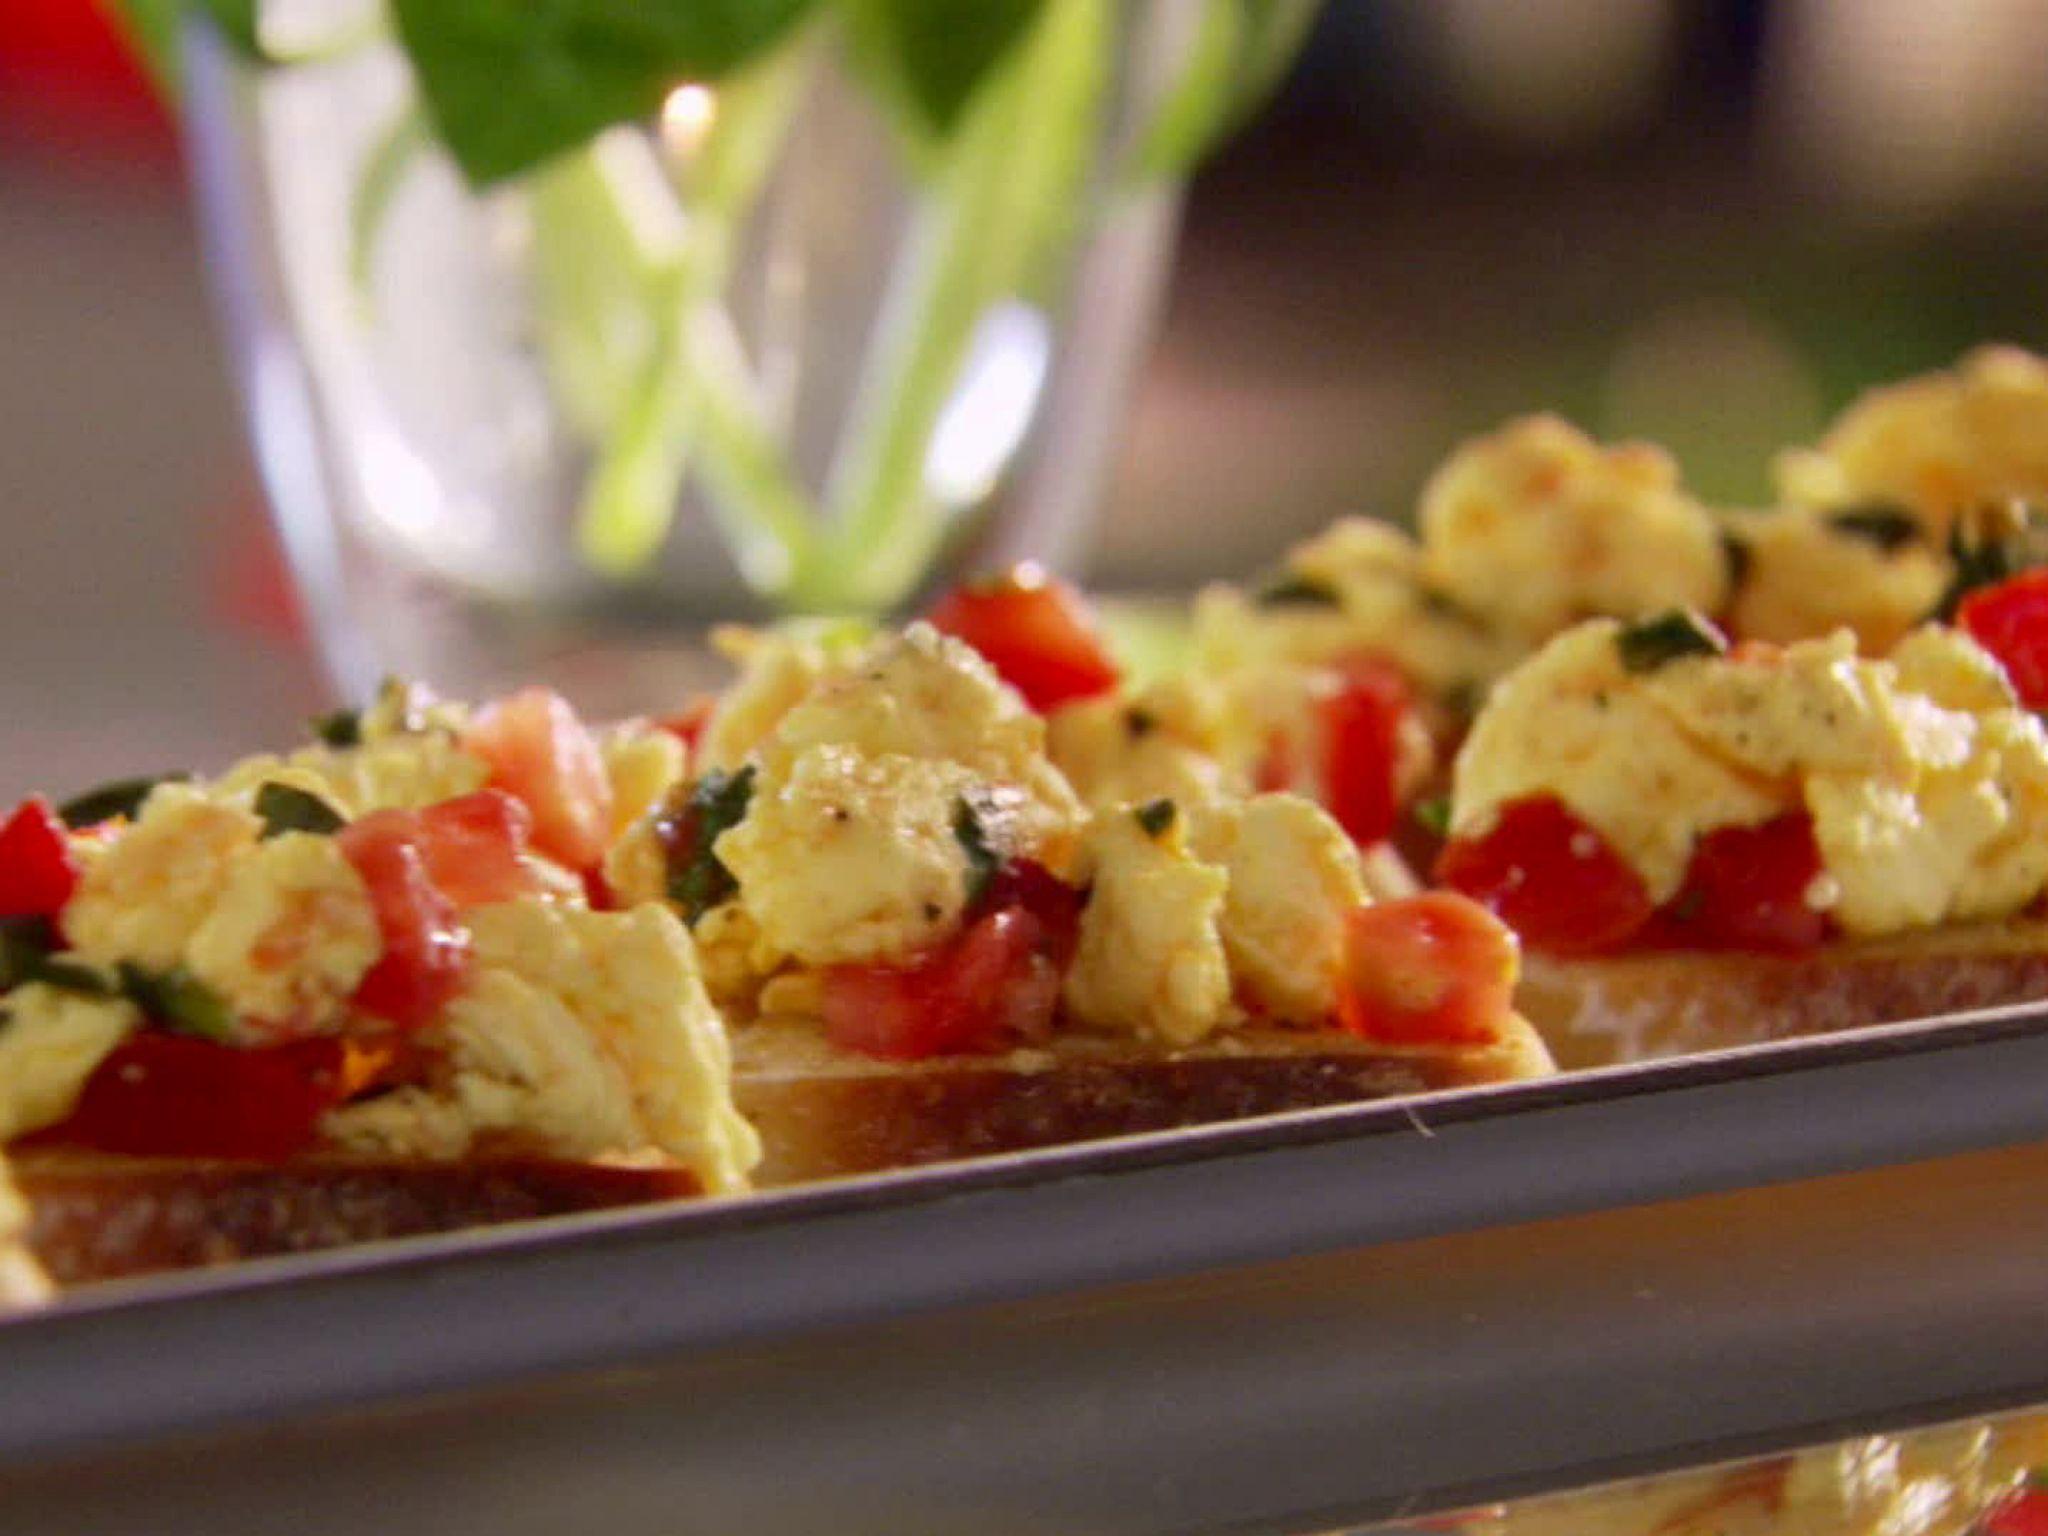 Breakfast Bruschetta recipe from Hungry Girl via Food Network